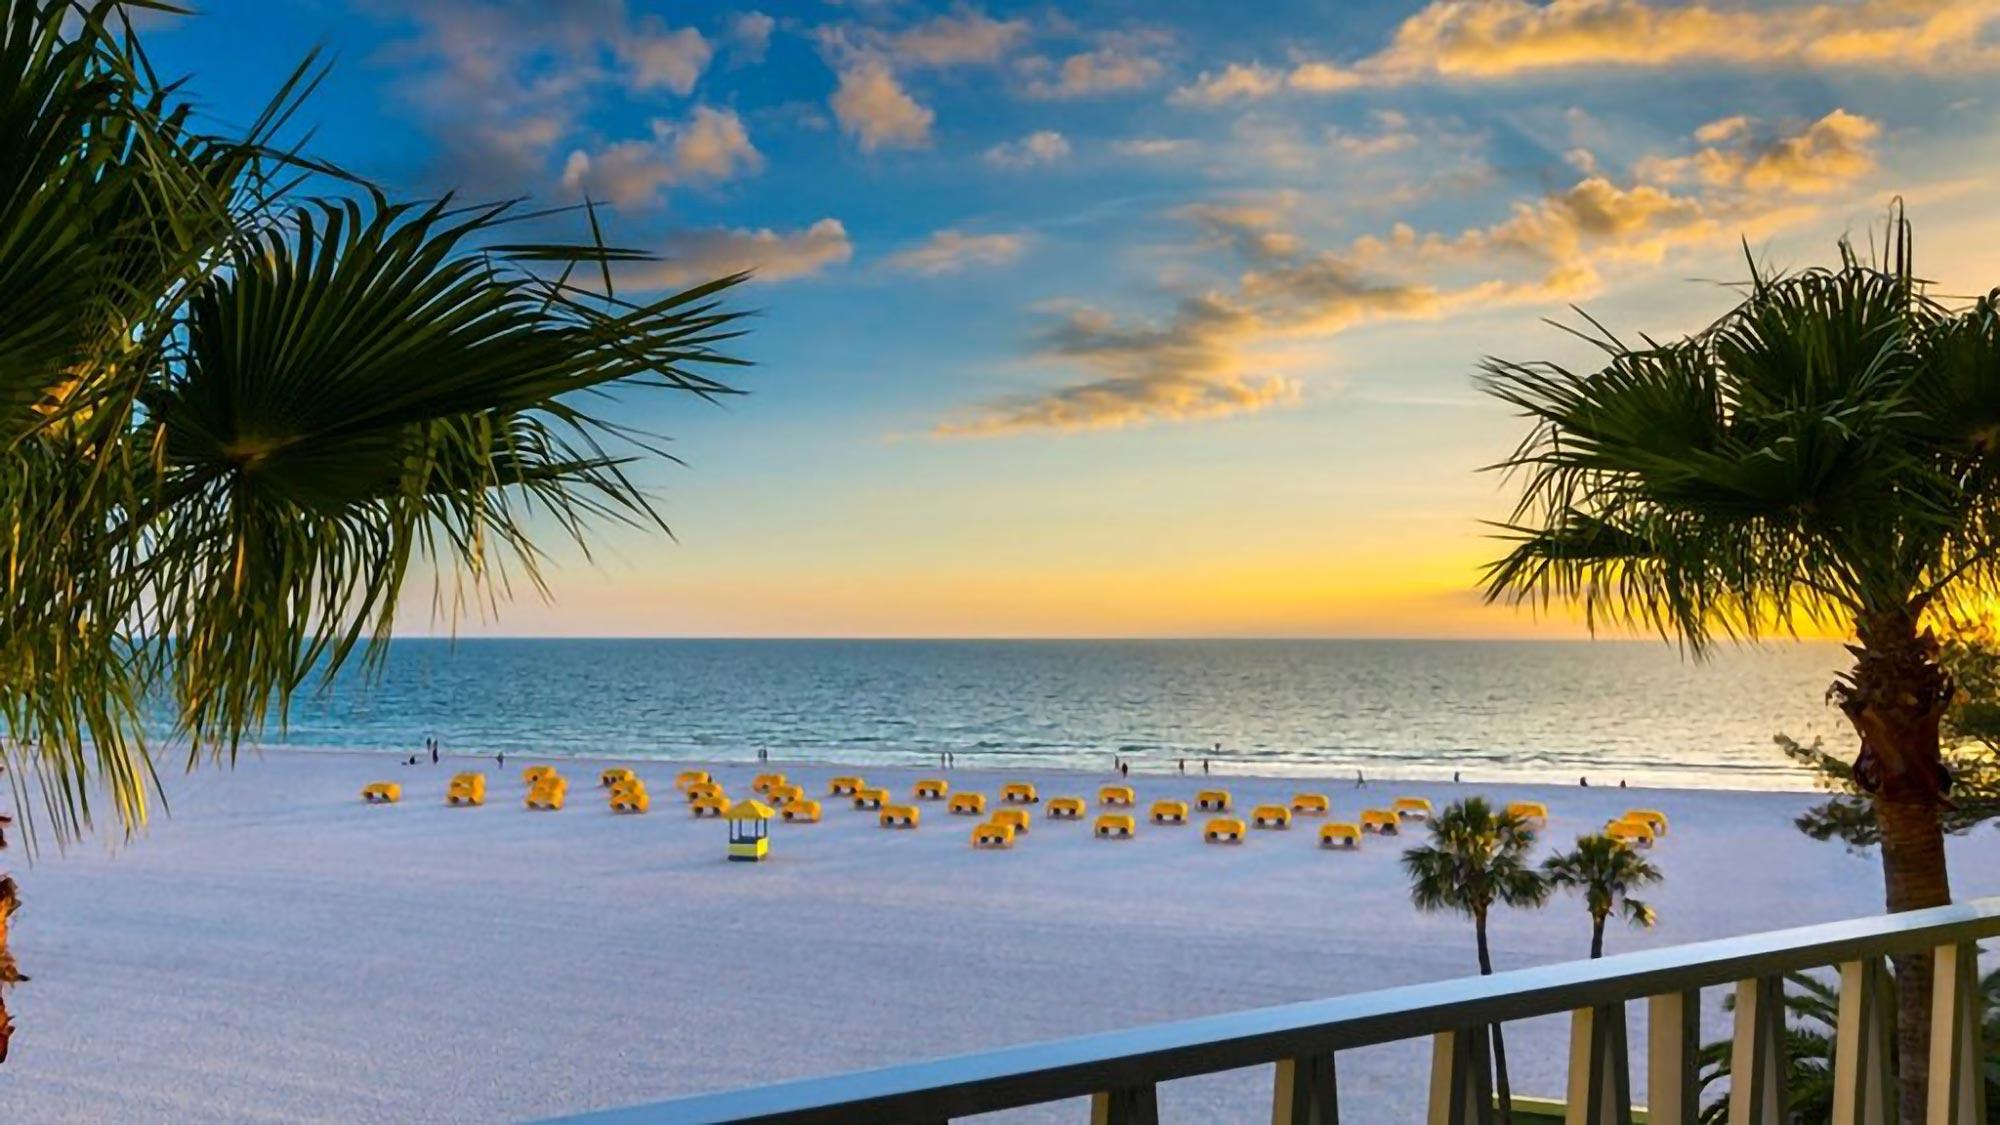 Saint Pete Beach, Florida, USA